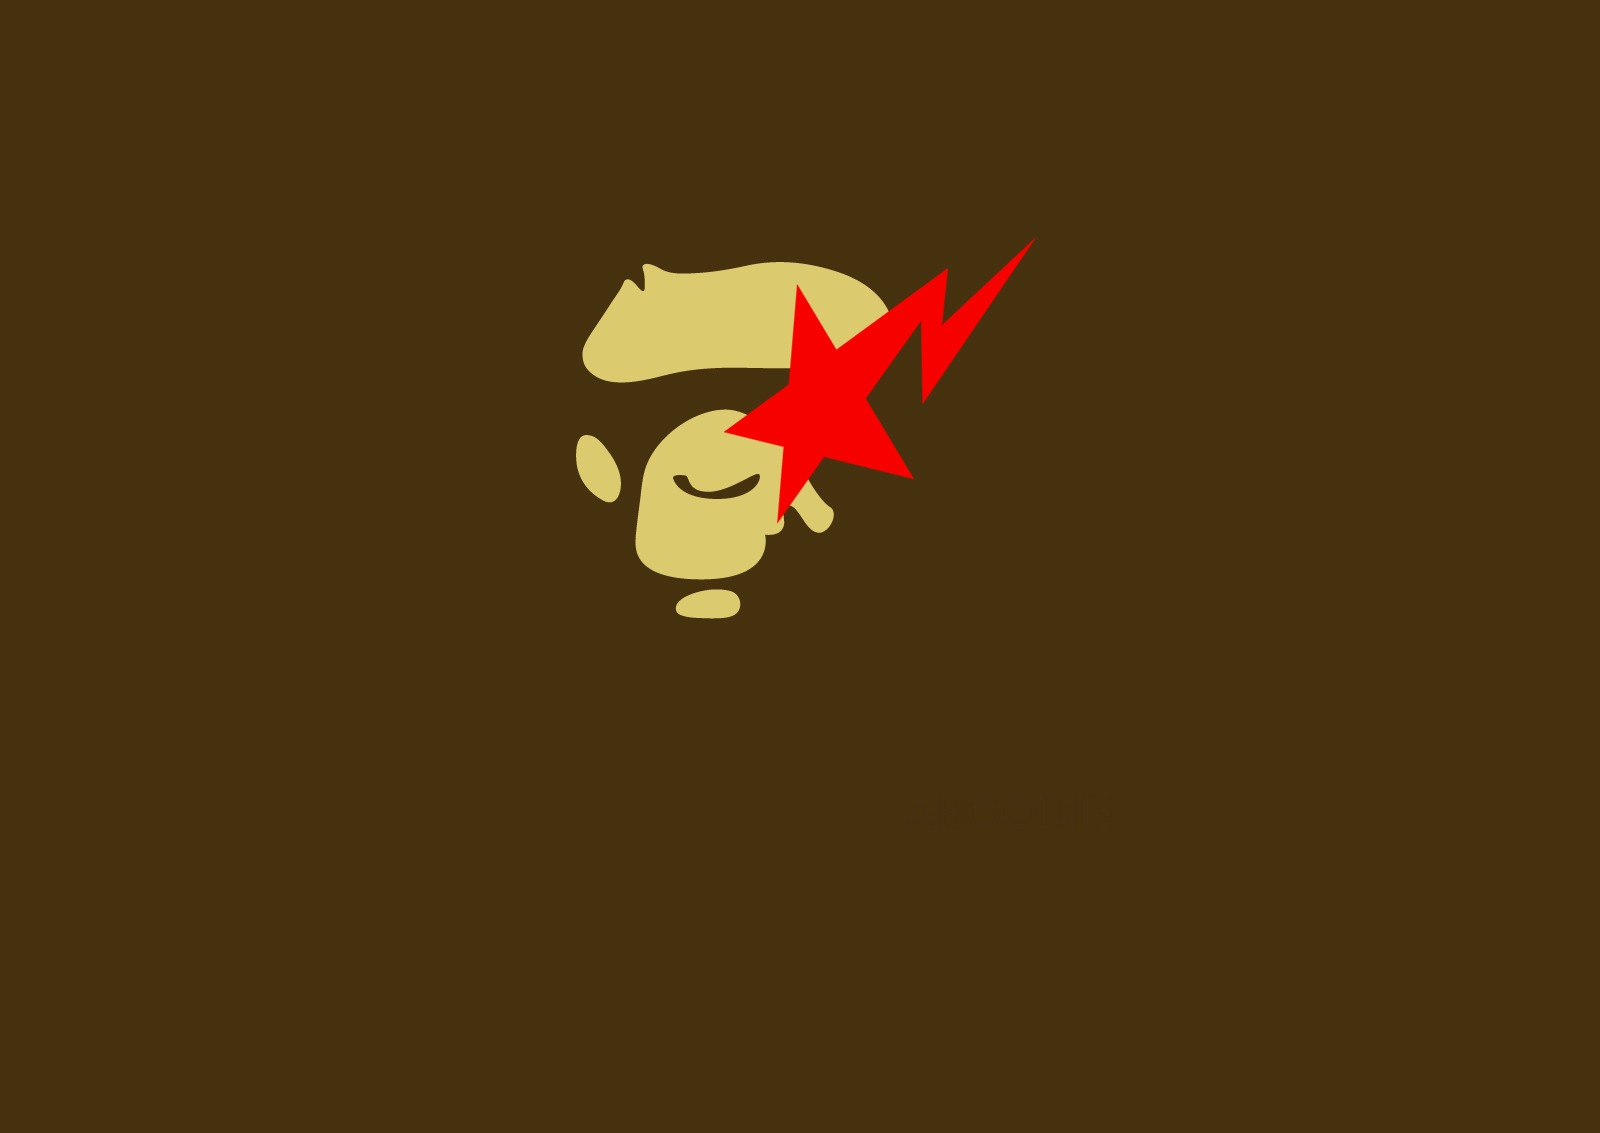 http://4.bp.blogspot.com/-8DPDy7OWpFo/T0k18c_DMsI/AAAAAAAABjw/ZEbA5nNcXo4/s1600/Bape_huge_logo_big_a_bathing_ape_wallpaper_wallpapers_3-1600x1200.jpg